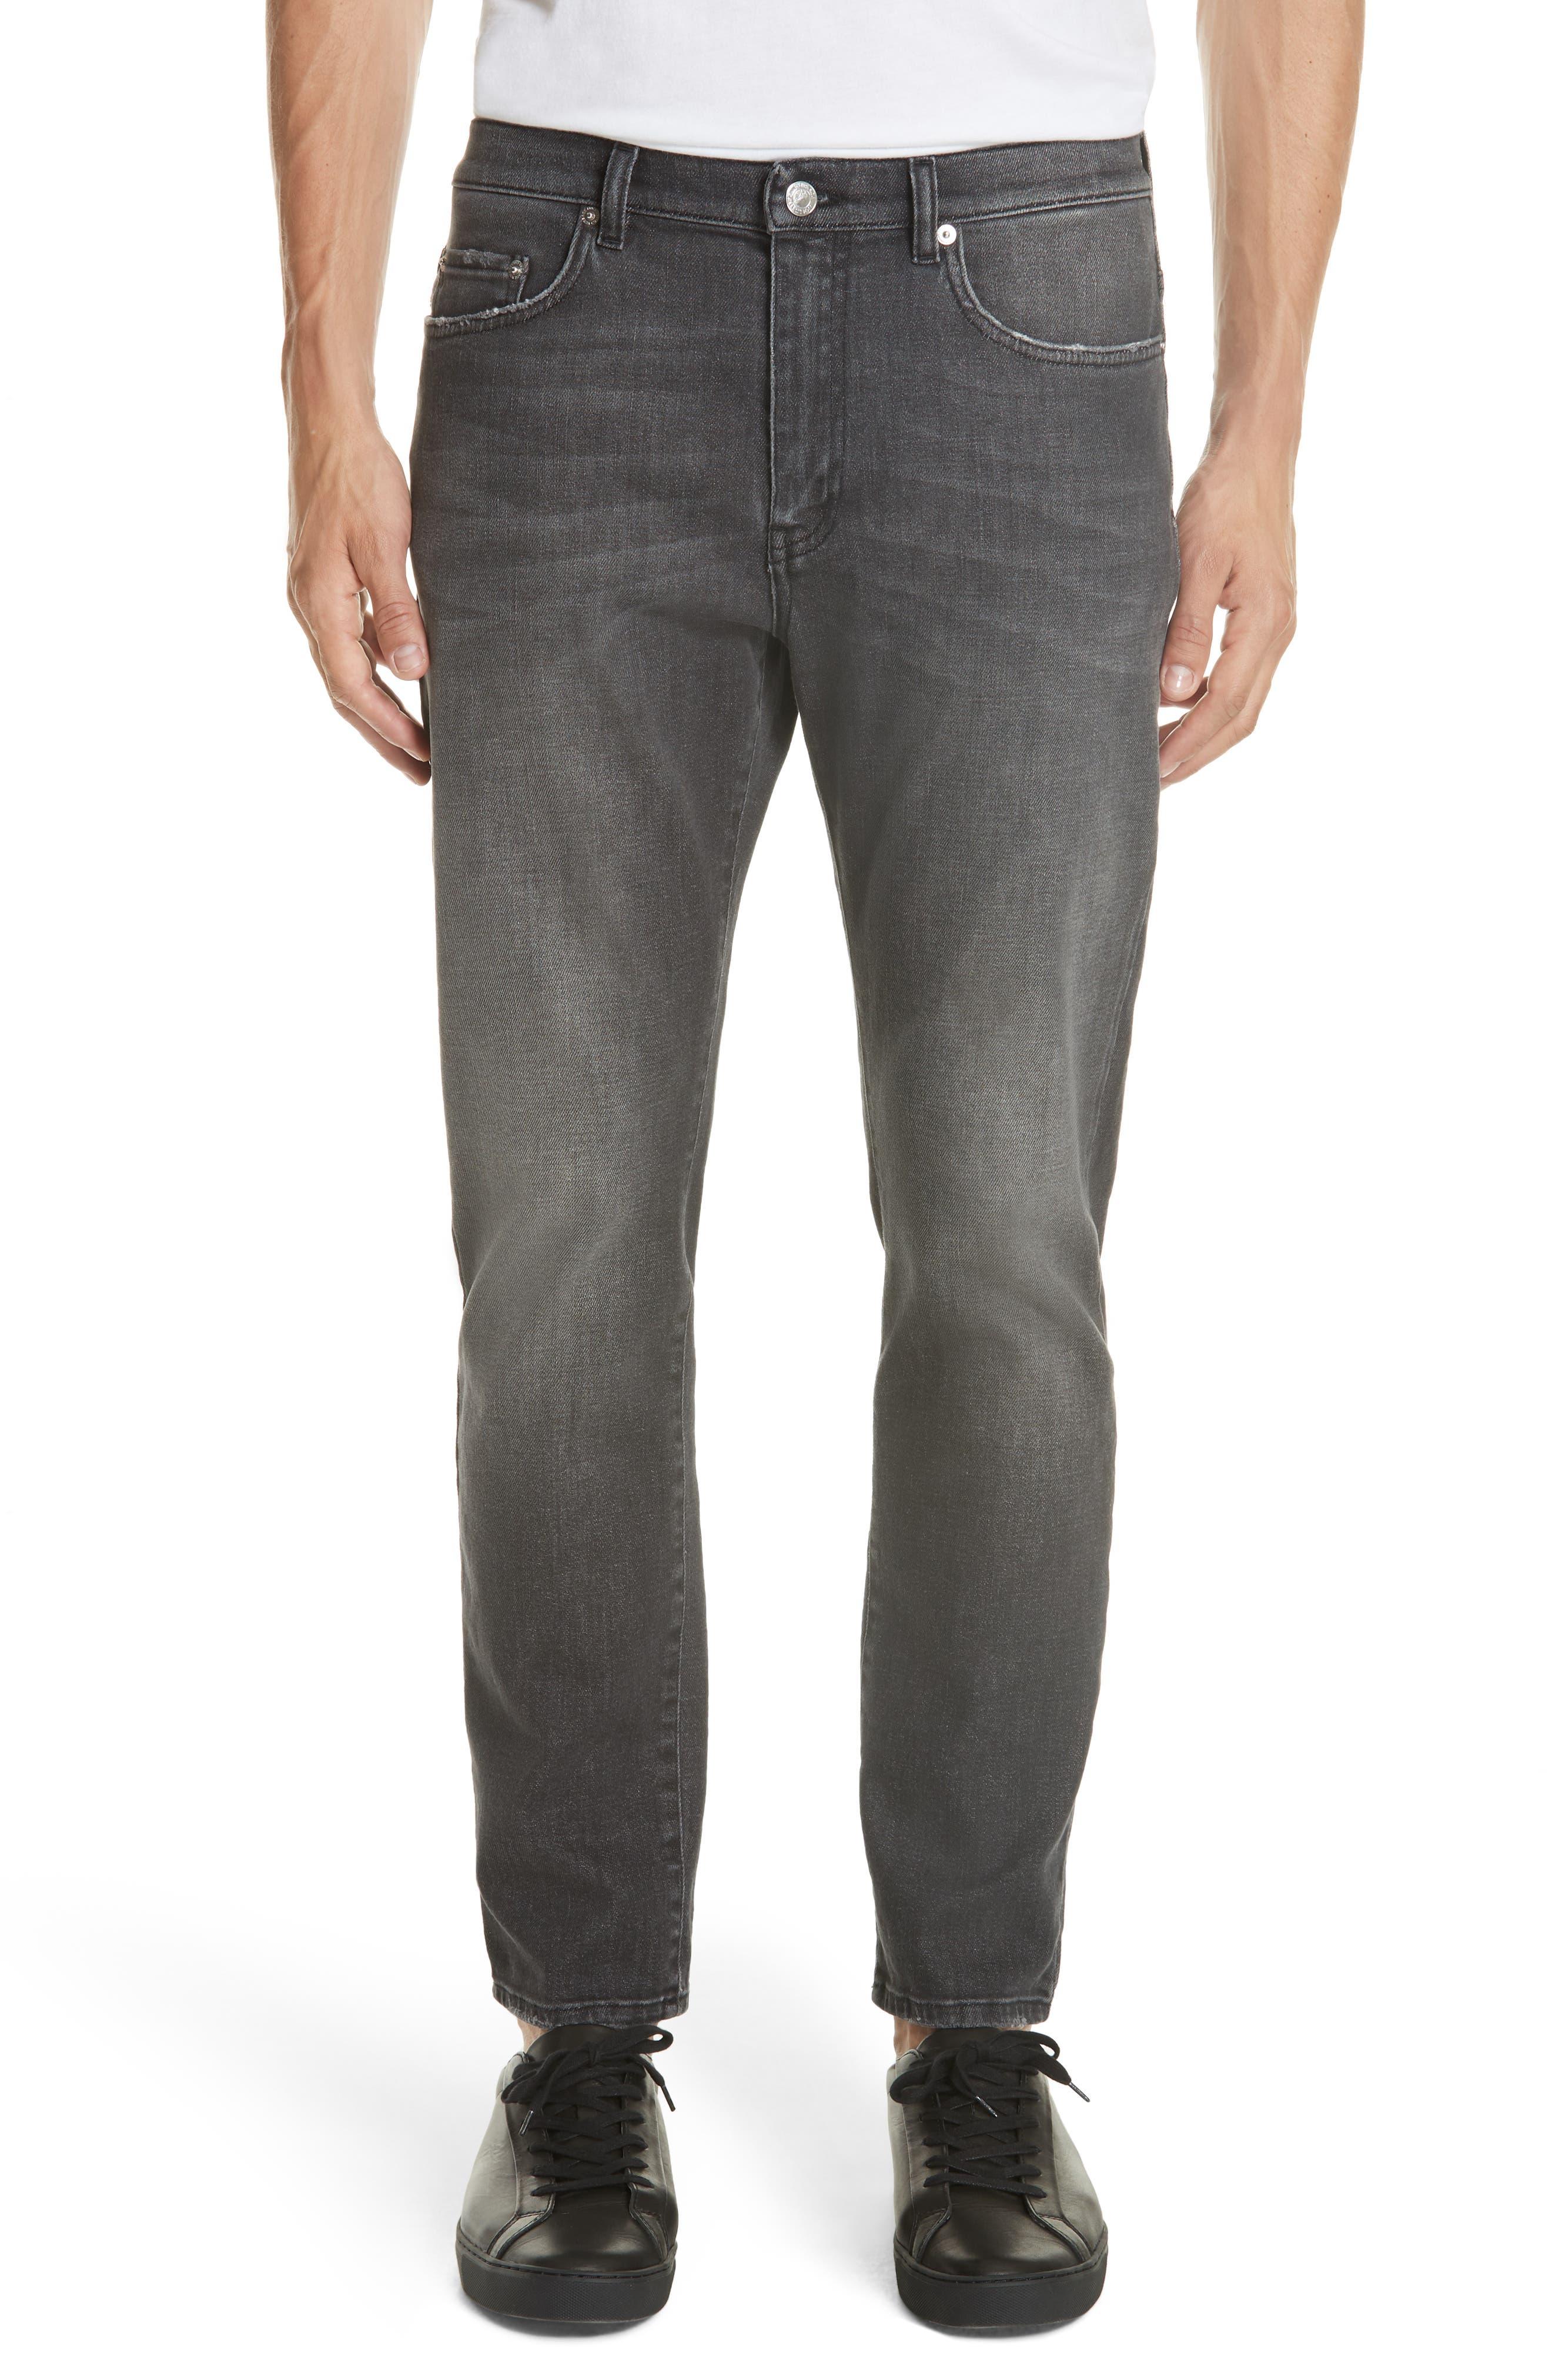 VERSACE COLLECTION Medusa Pocket Jeans, Main, color, 020